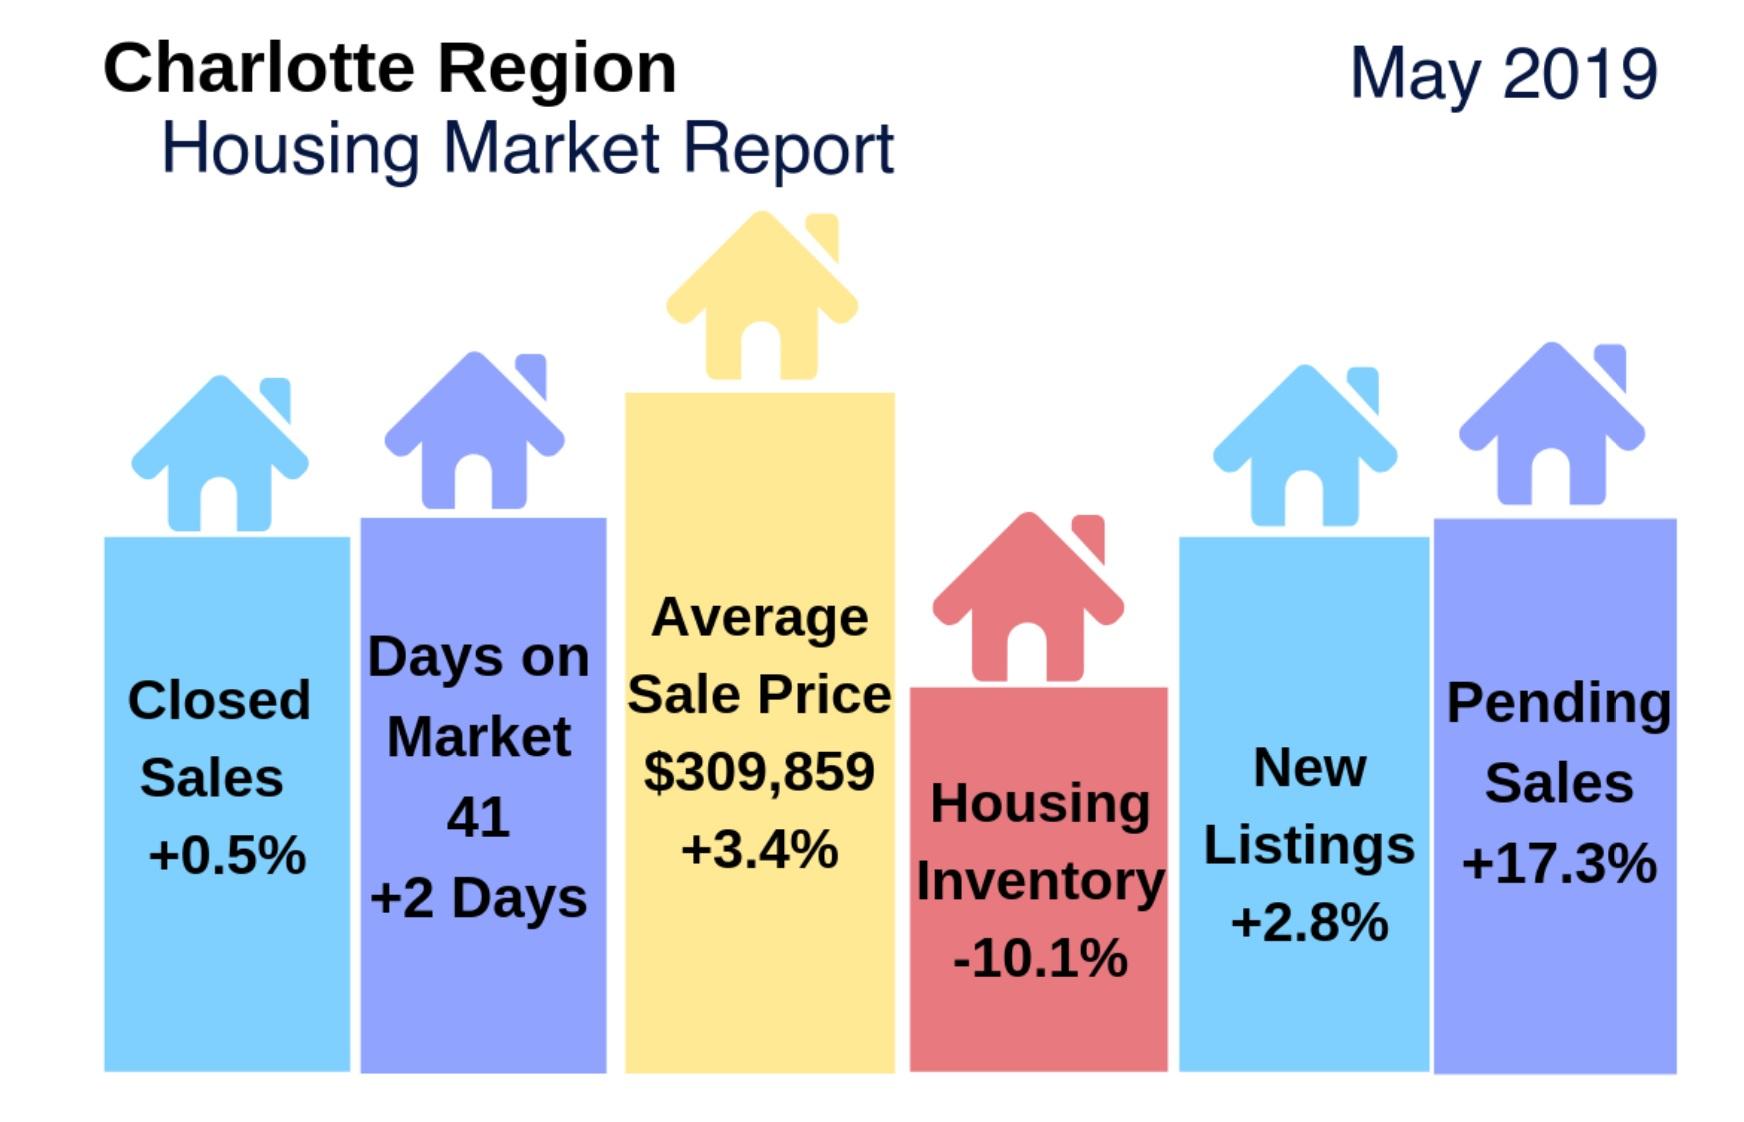 Charlotte Region Housing Update & Video: May 2019